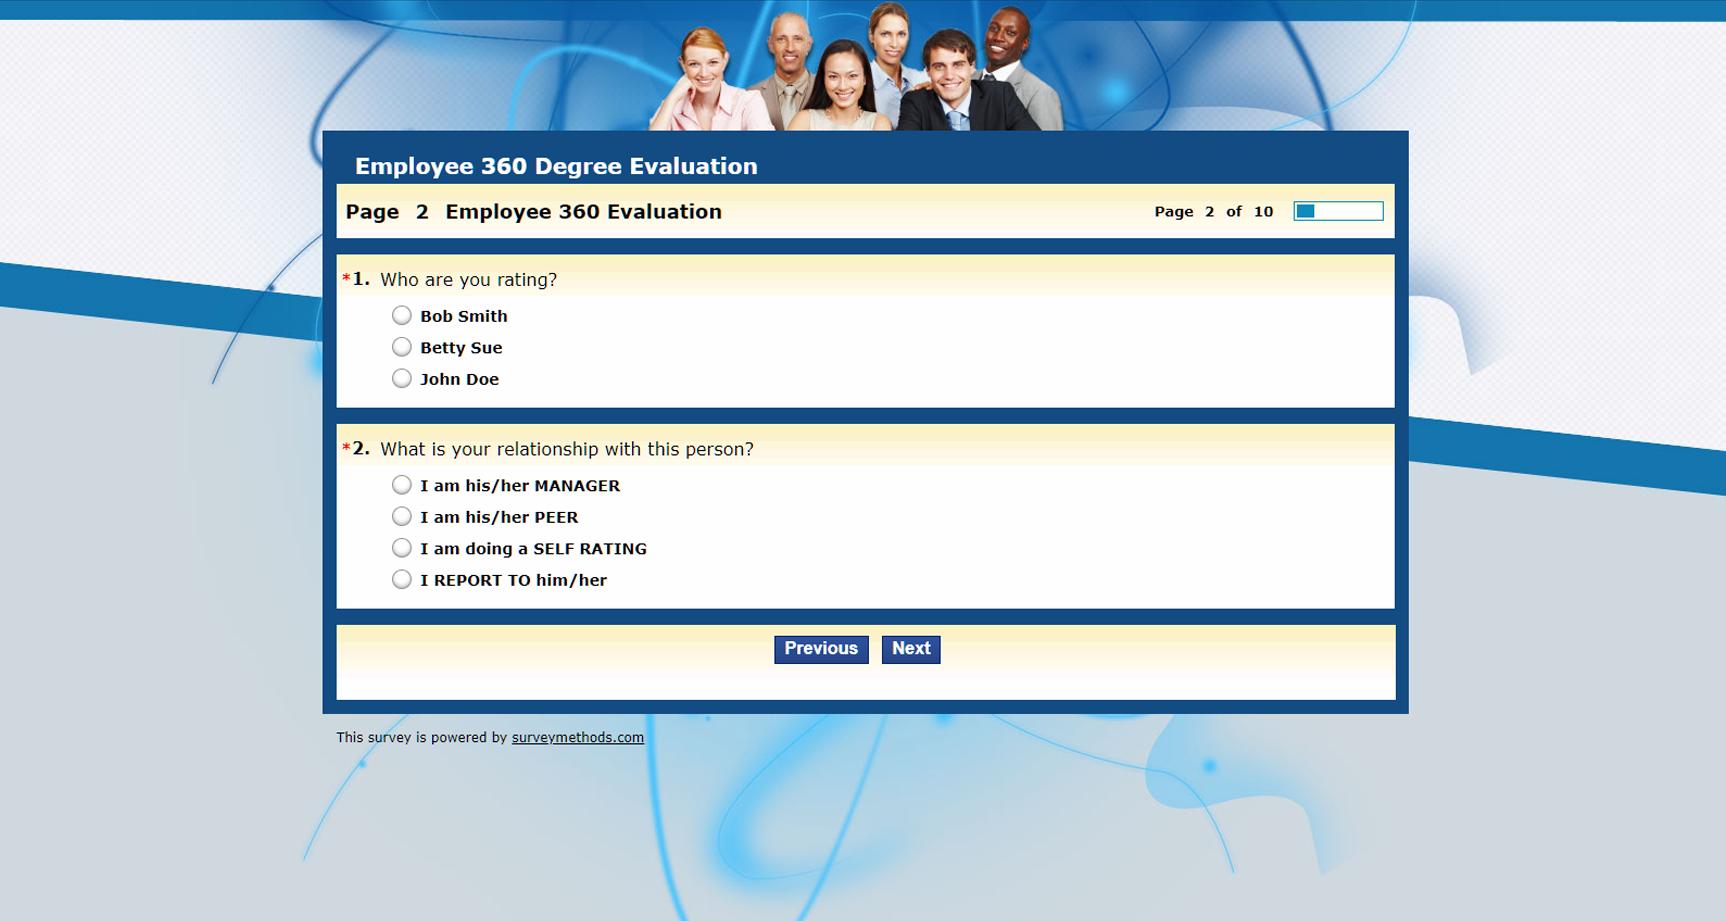 Employee 360 Degree Evaluation Survey